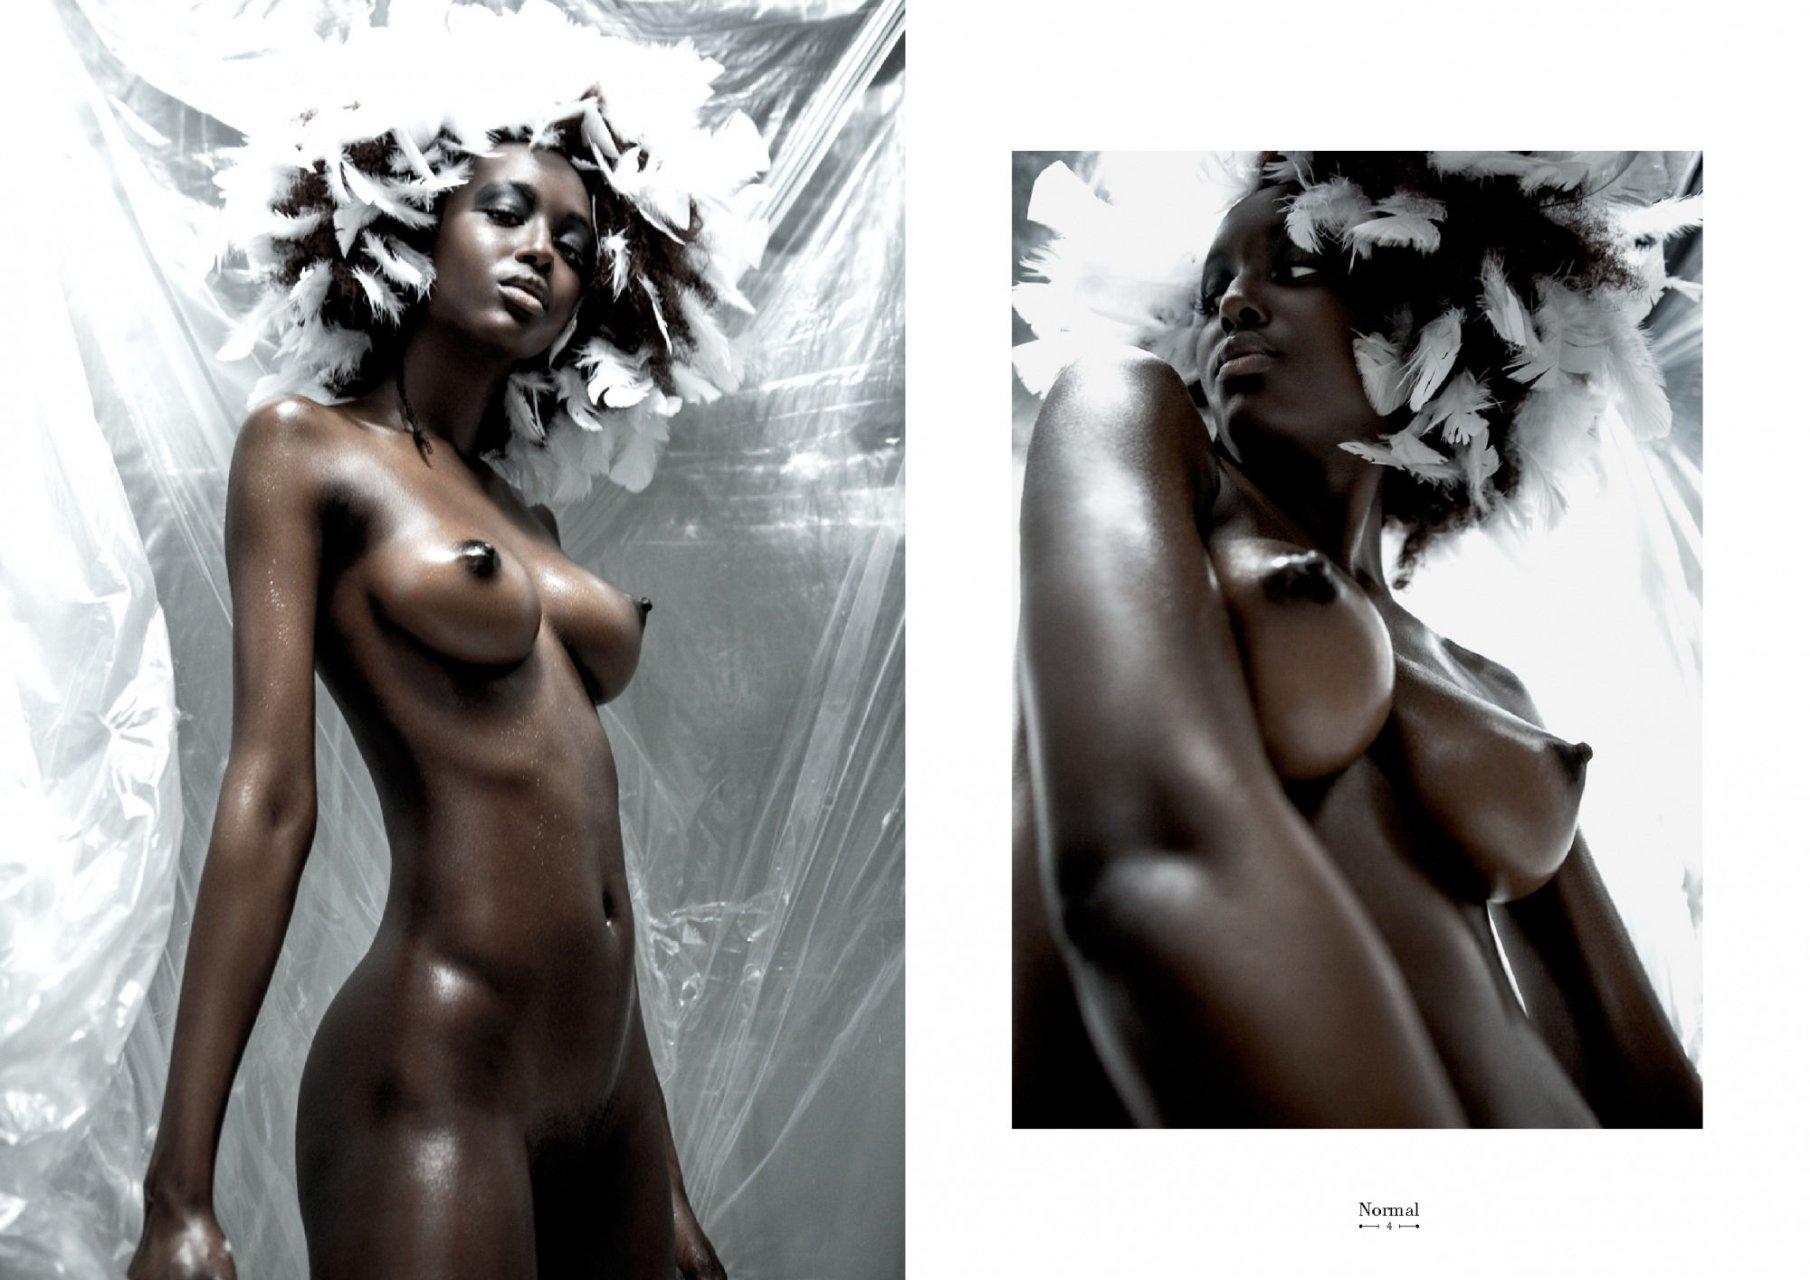 Mahreeyam jah topless nudes (16 pics)